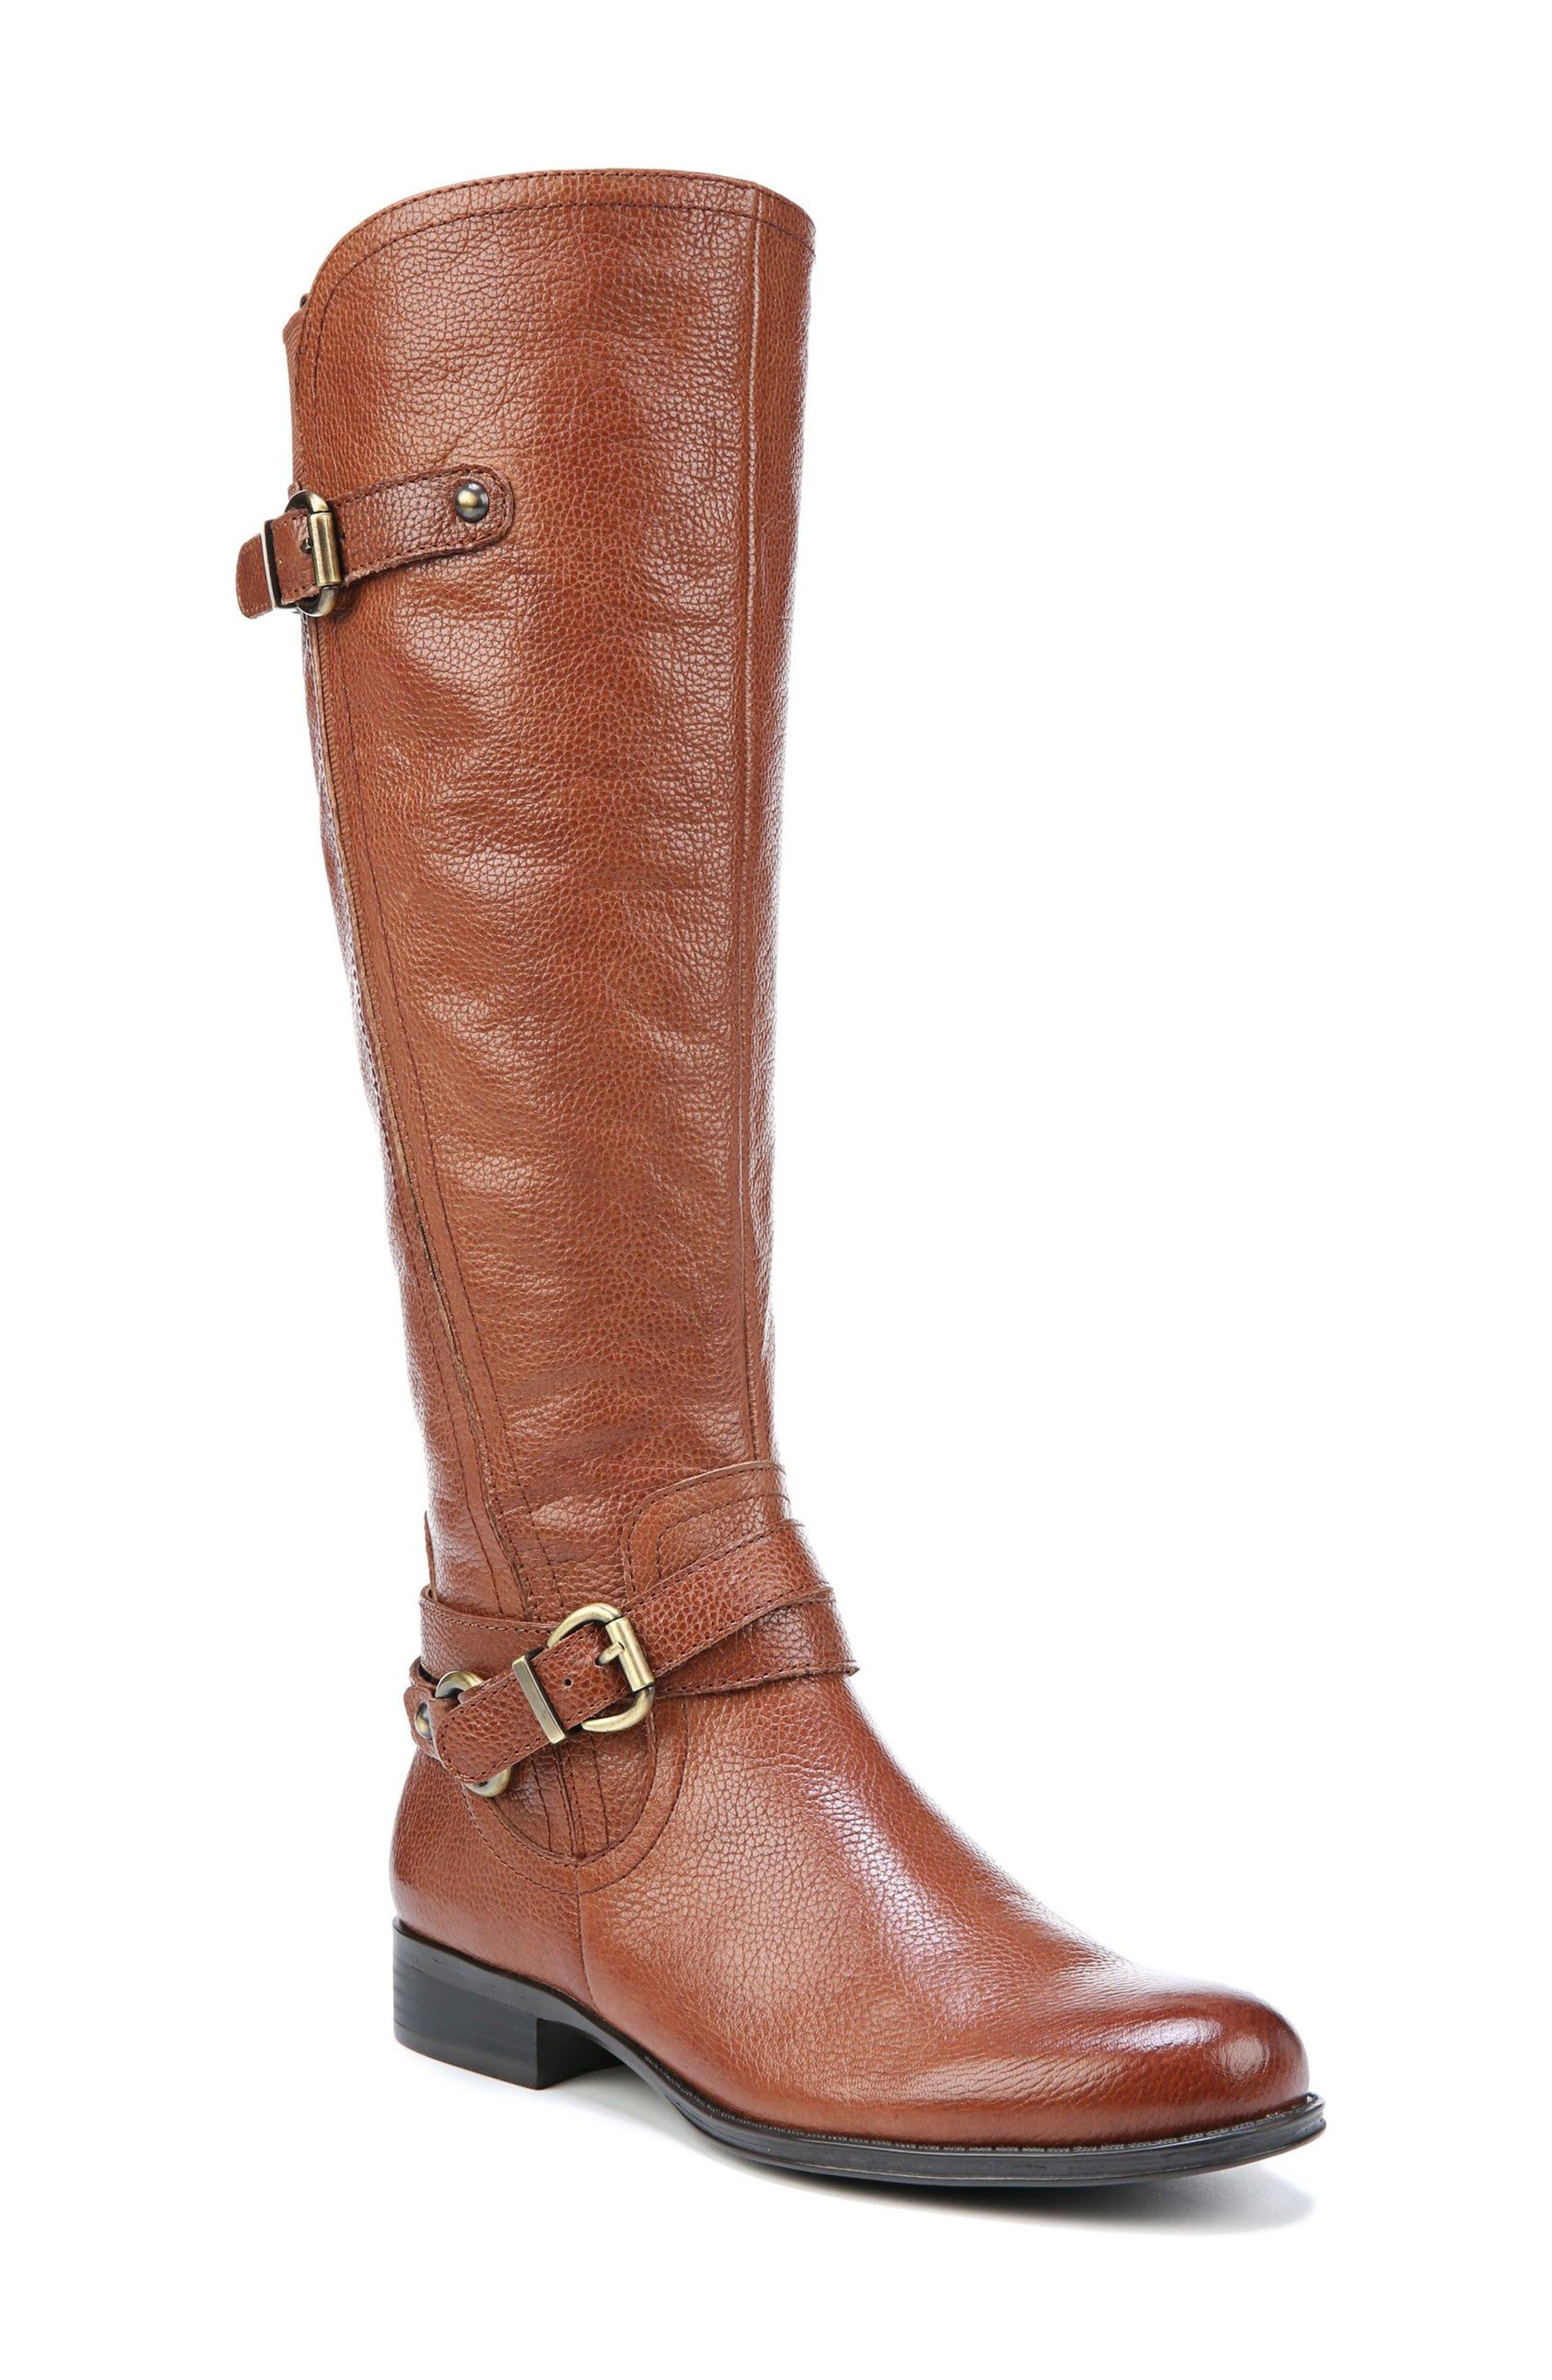 Main Image - Naturalizer Jodee Knee High Boot (Women) (Wide Calf)